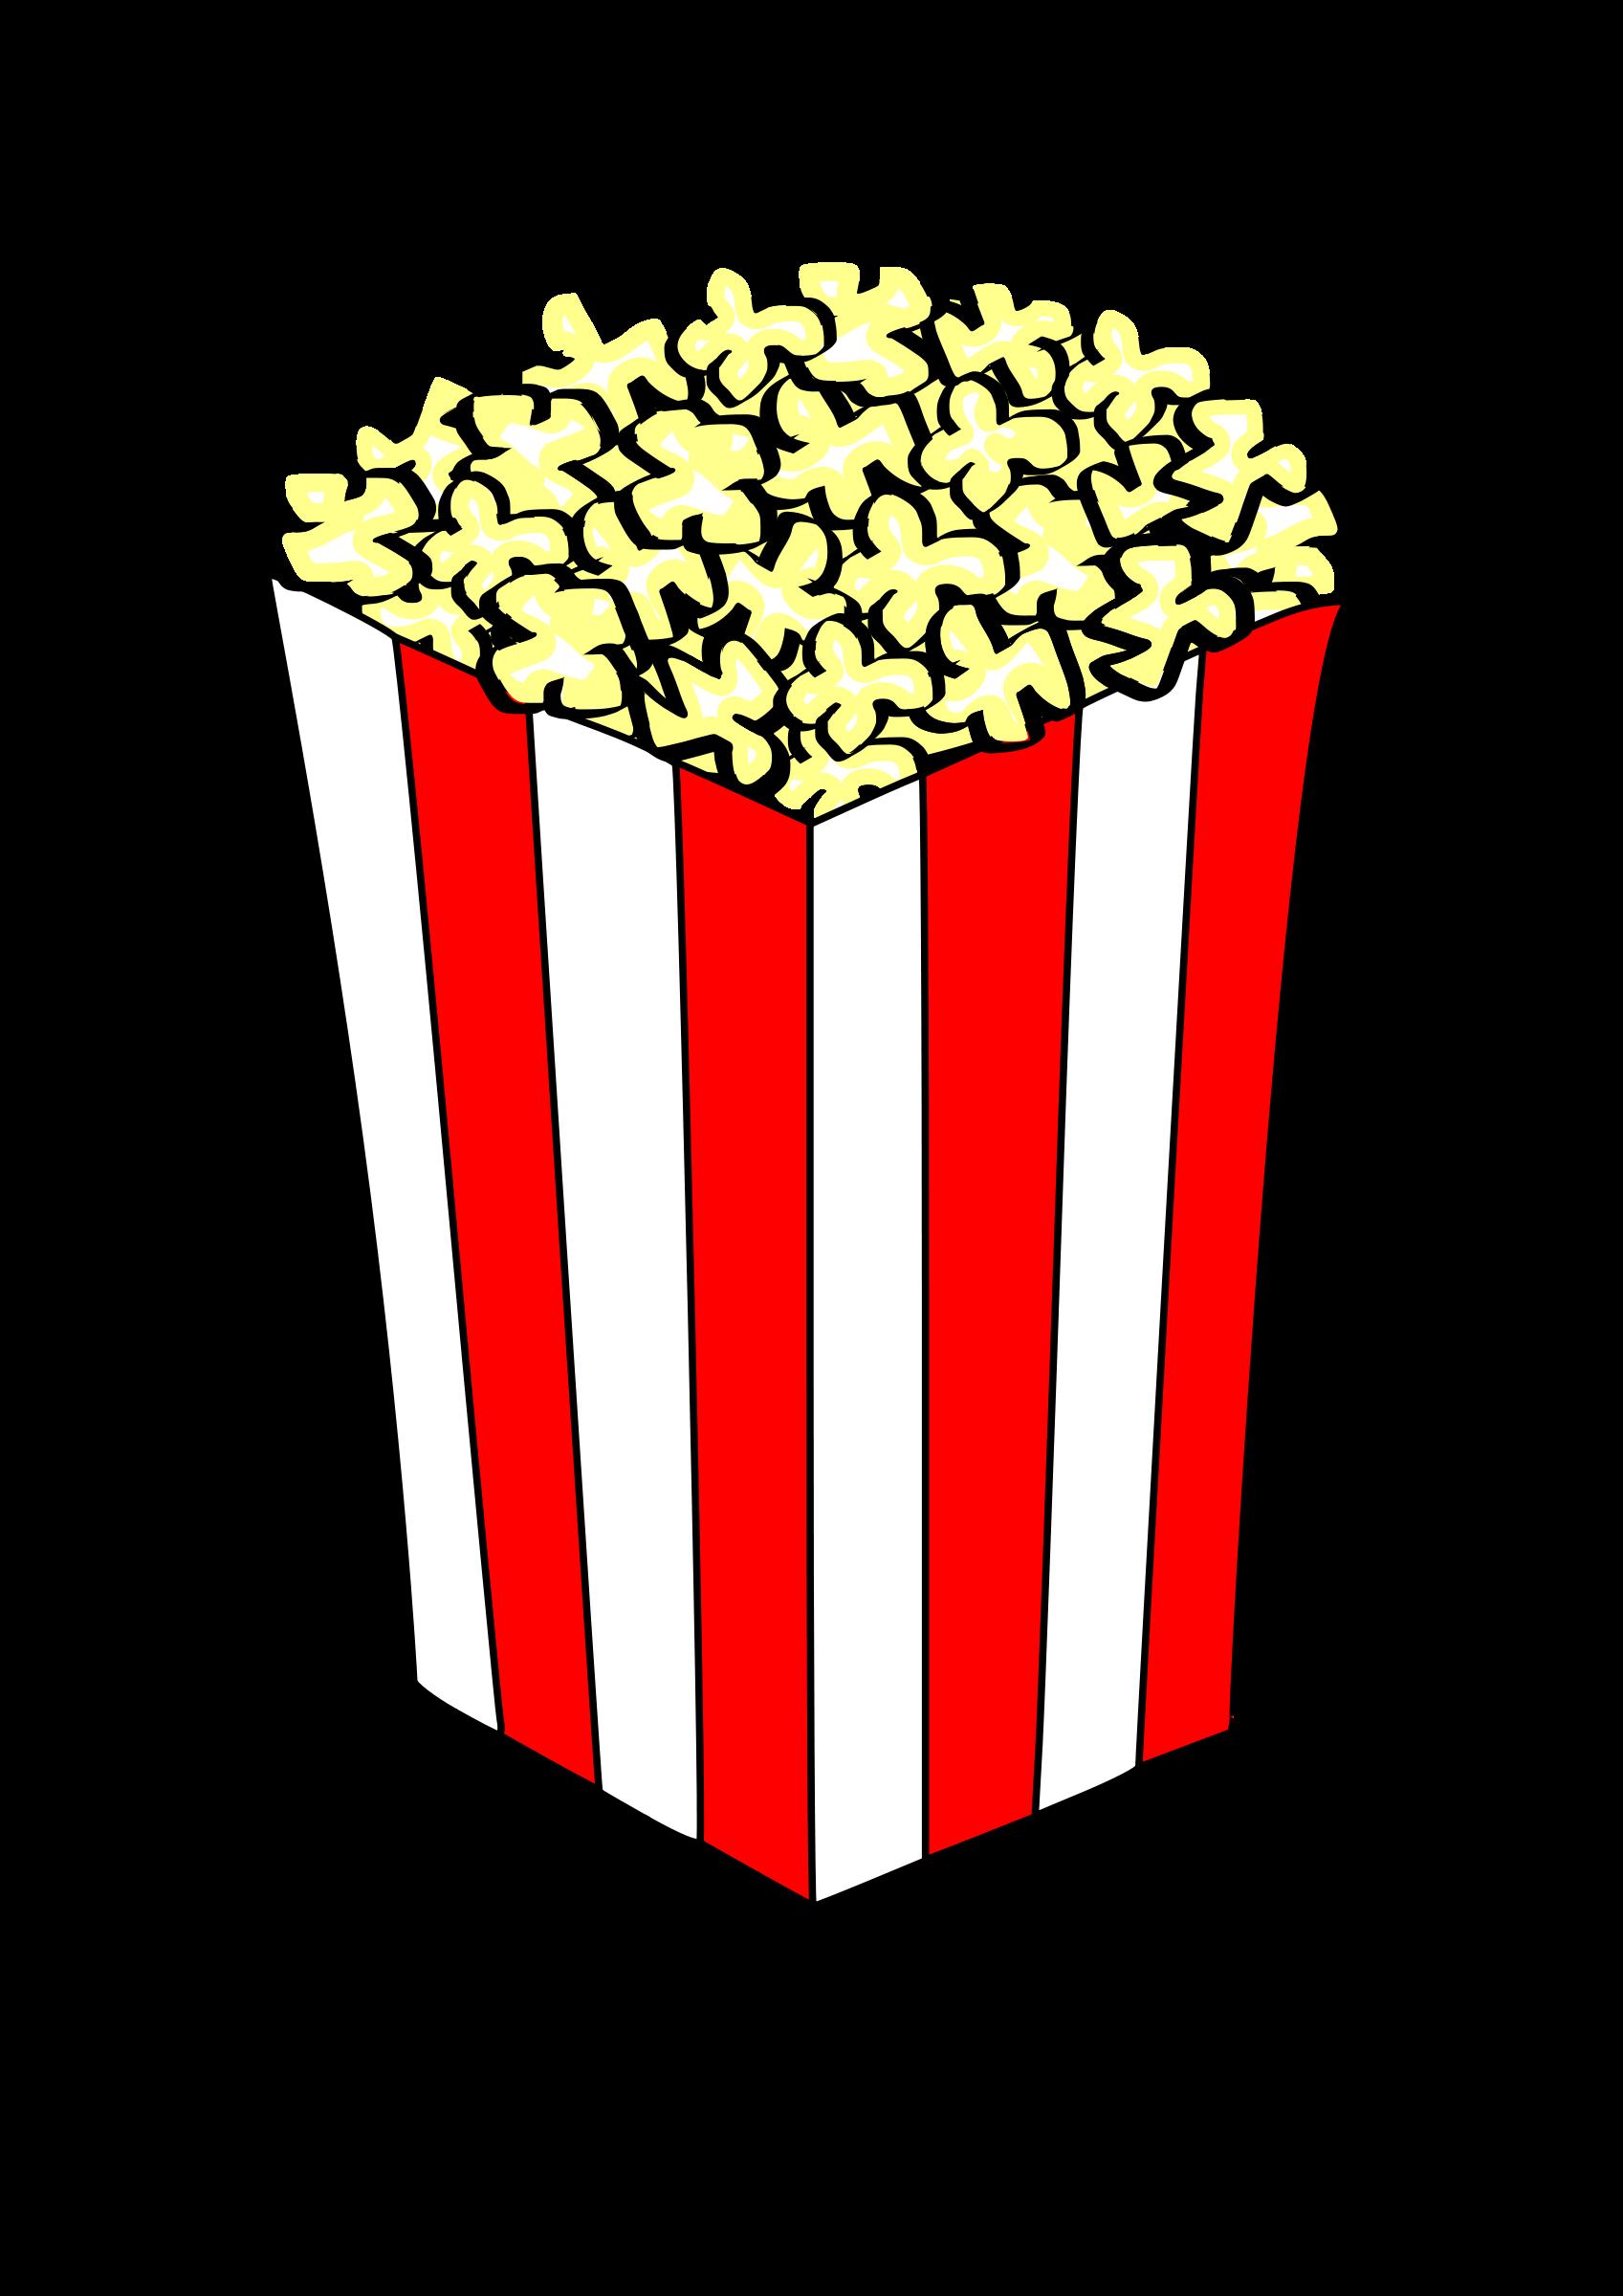 Clipart trees popcorn. Clip art border panda